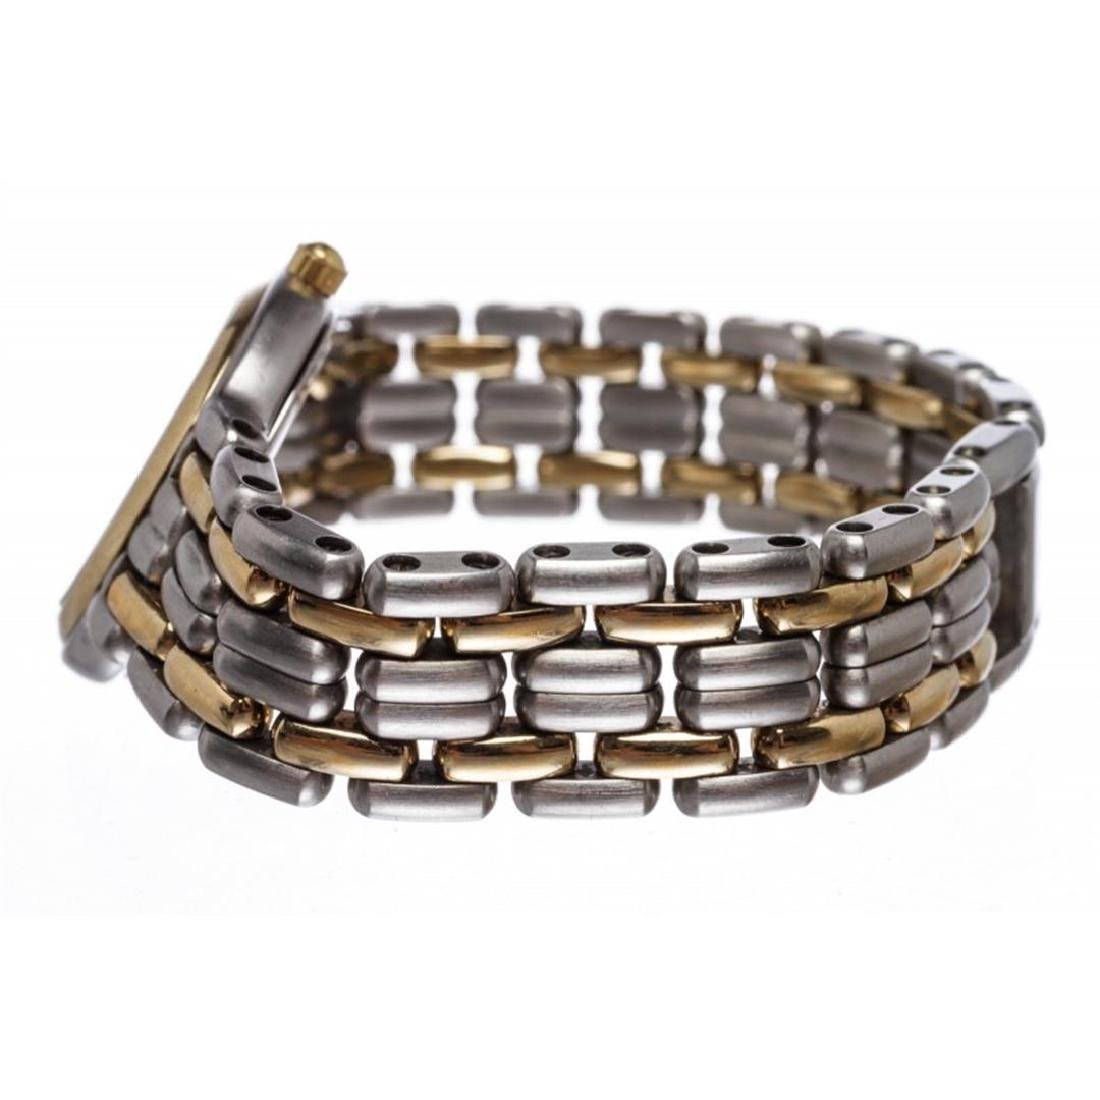 Raymond Weil Geneve Quartz Stainless Steel Wristwatch - 5